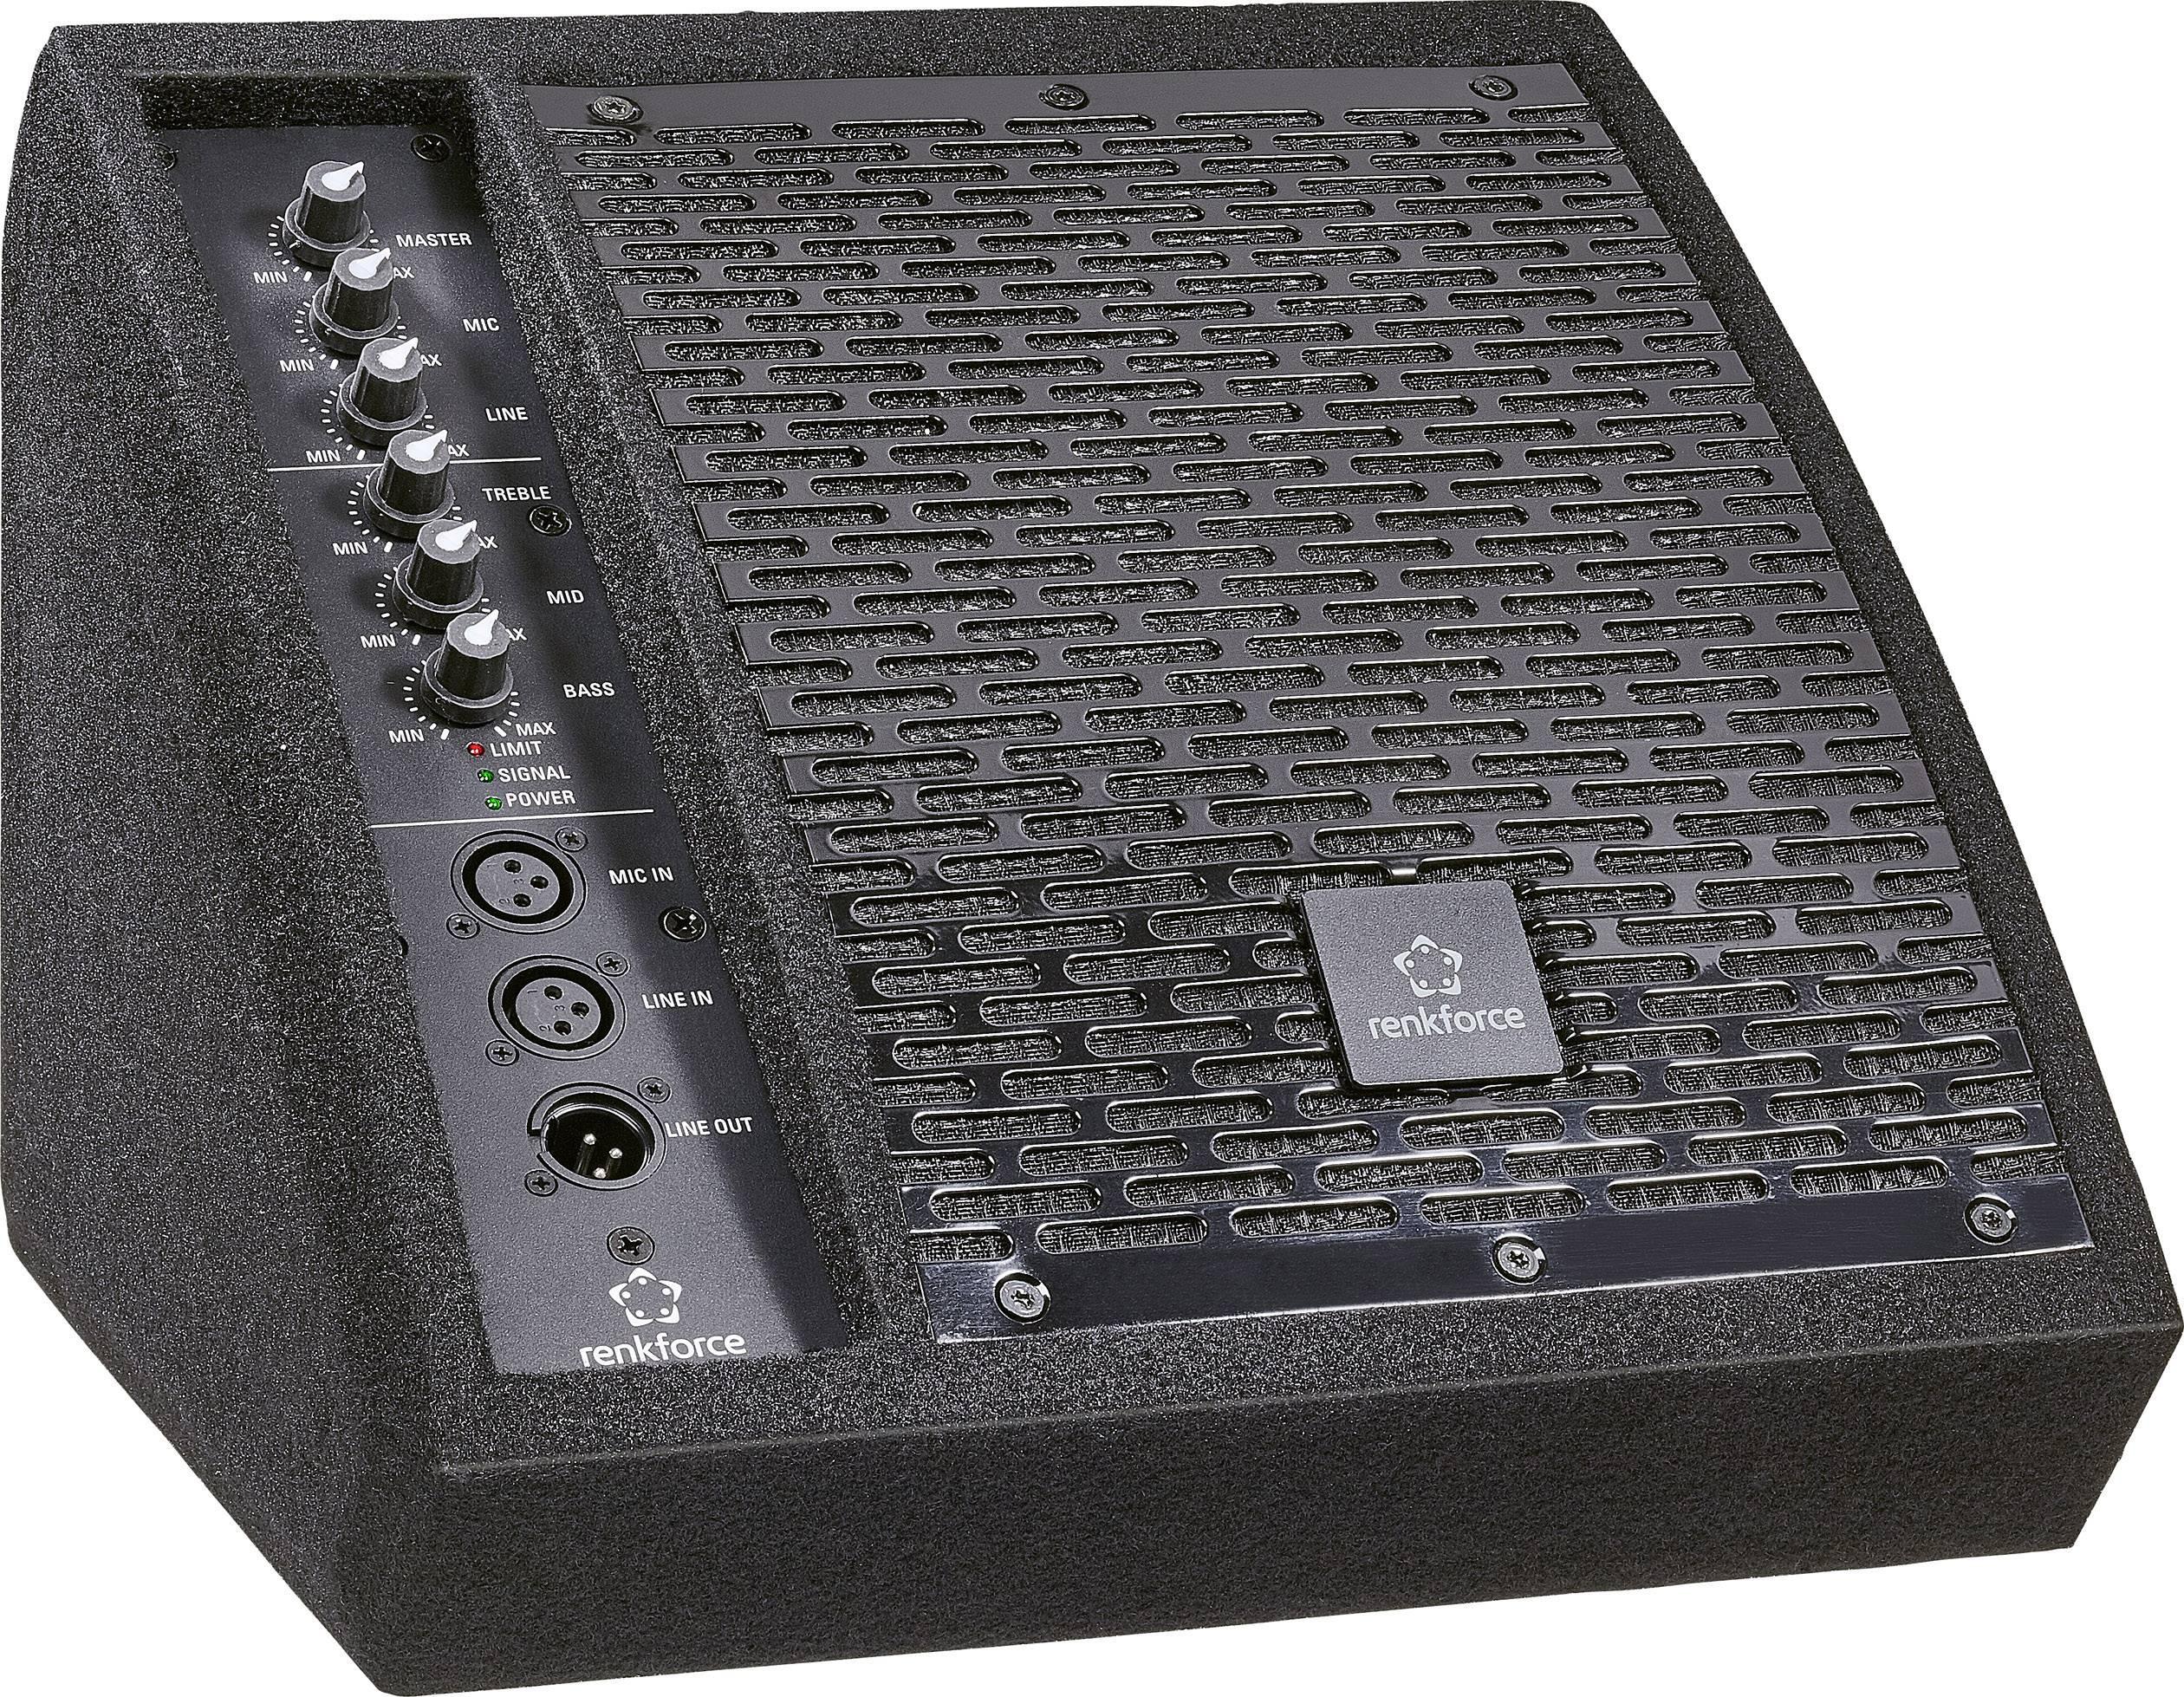 "Aktívny stage monitor Renkforce PAM 80A, 70 W, 20.32 cm (8 "") 1 ks"